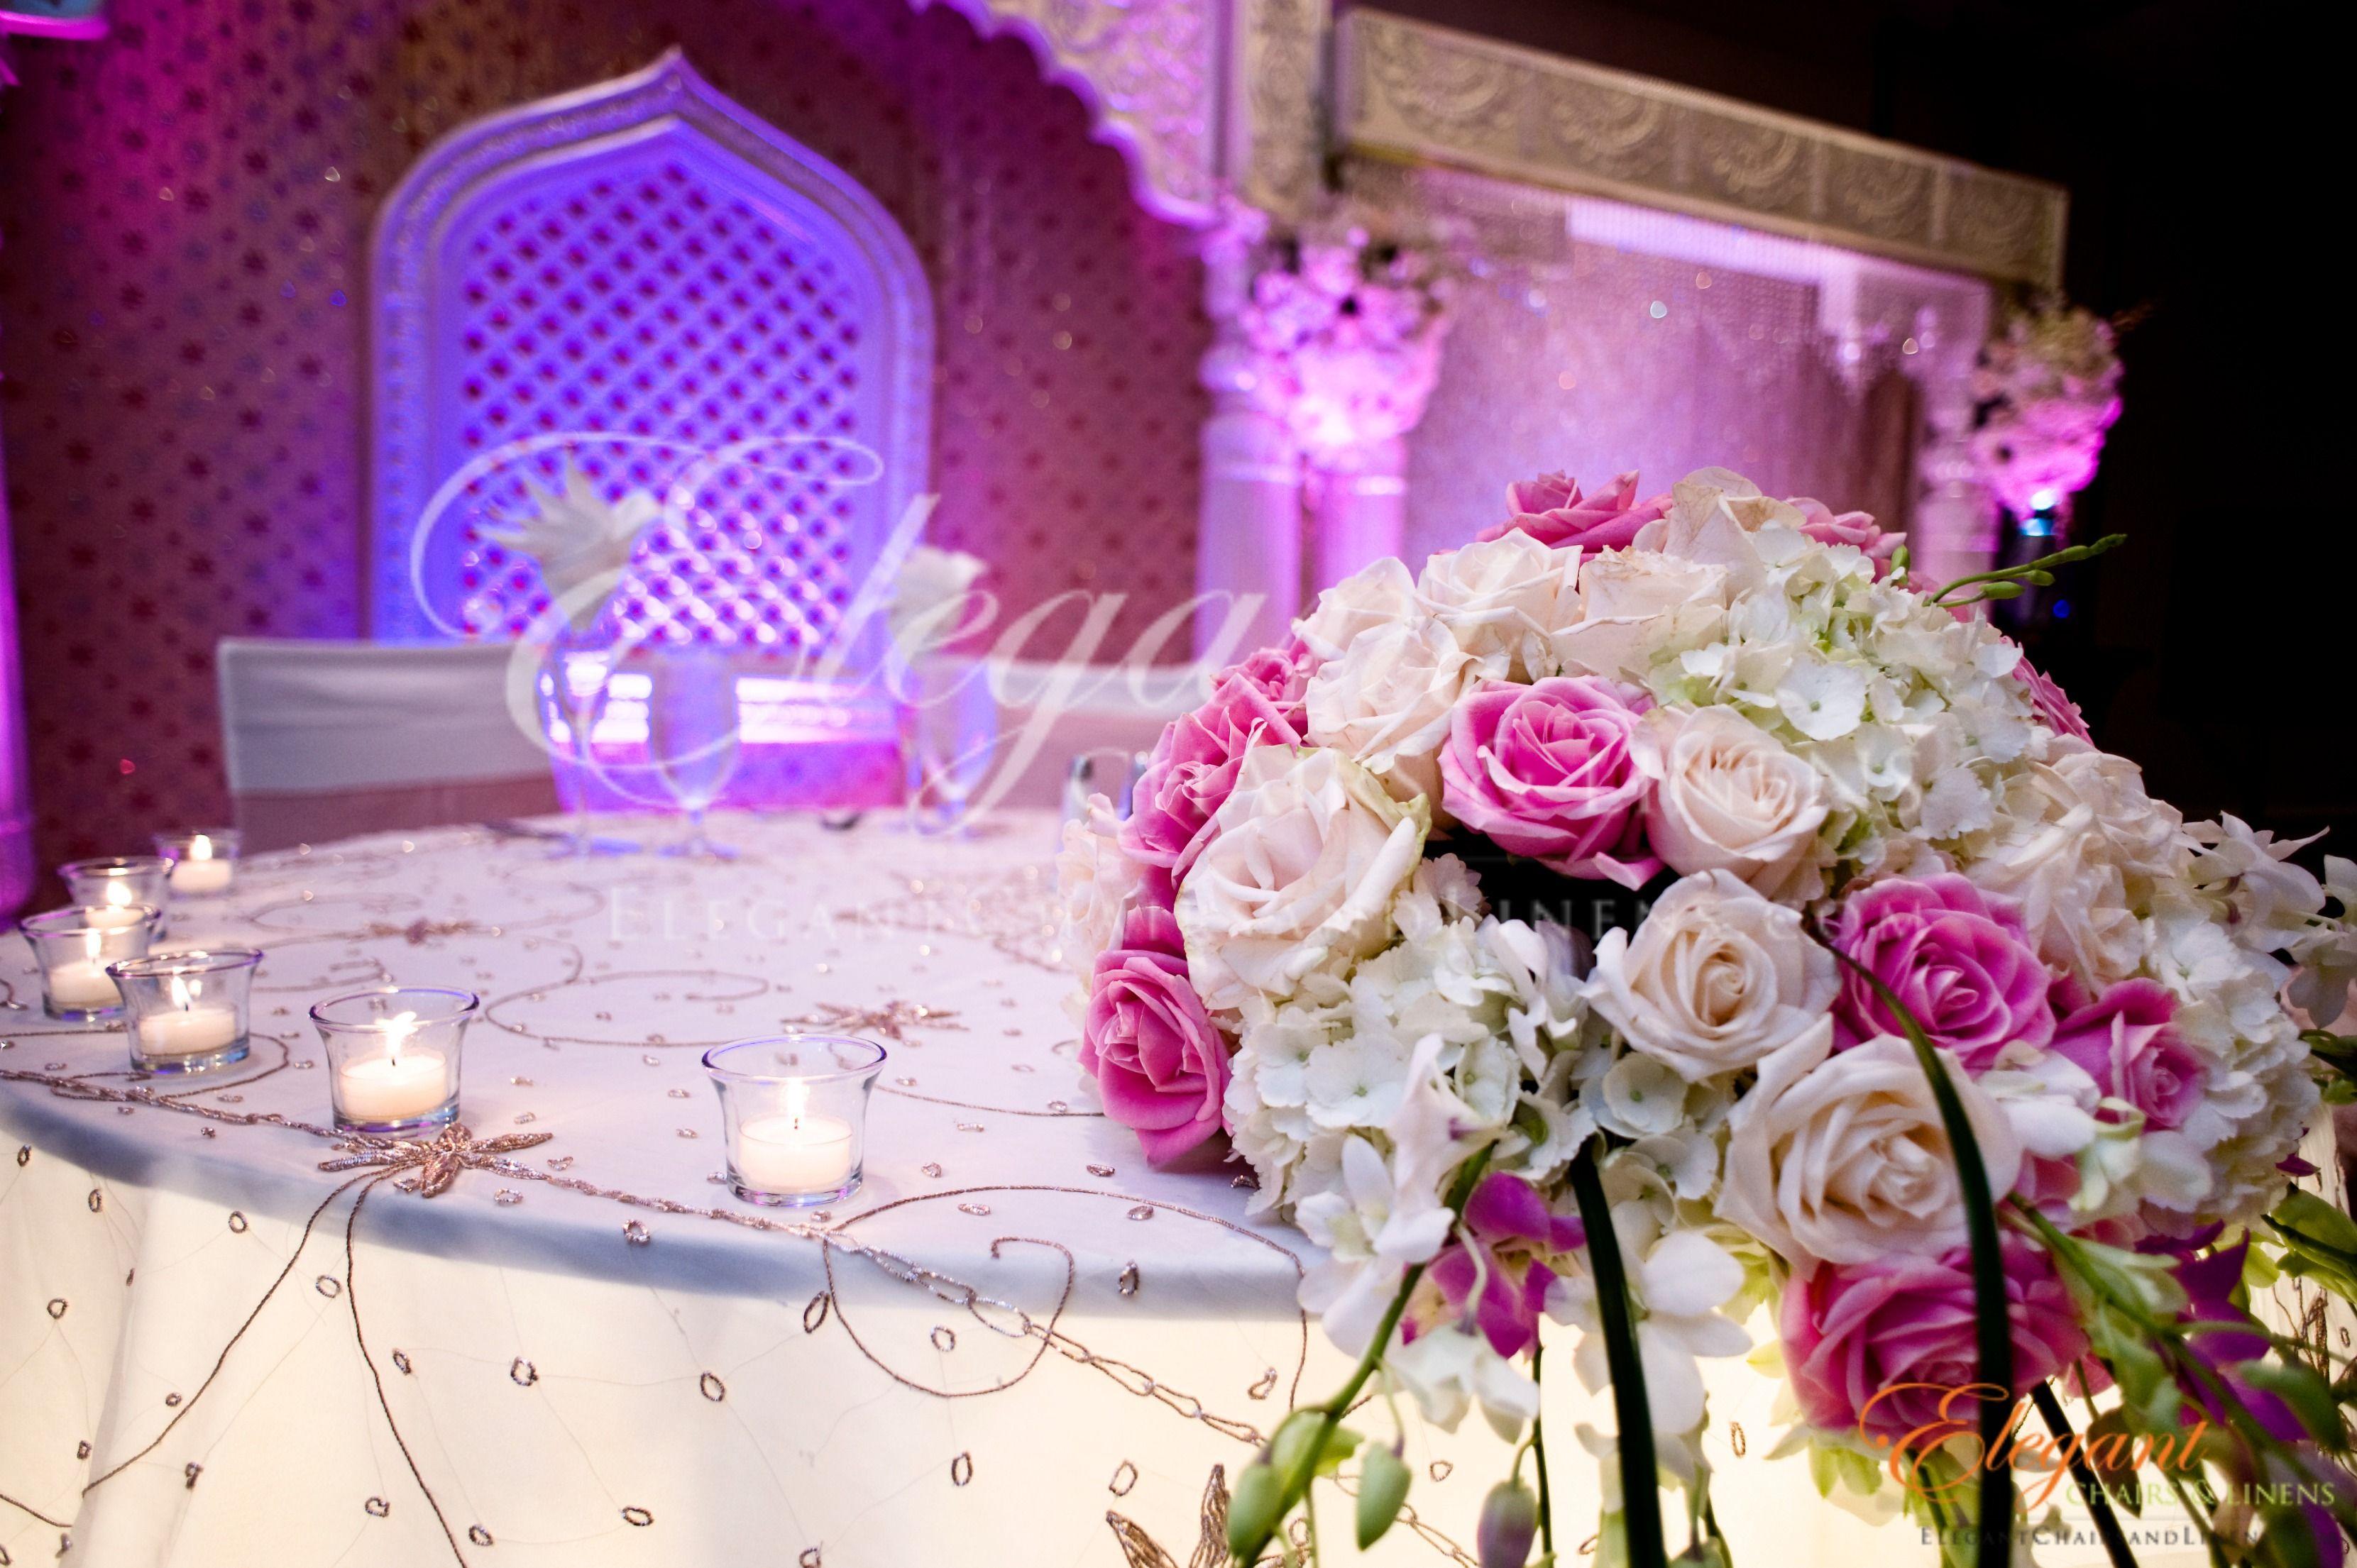 Wedding And Event Linens In Atlanta Ga Linens And Chiavari Chair Rental Atlanta Ga Www Elegantchairs Event Centerpiece Linen Rentals Reception Centerpieces